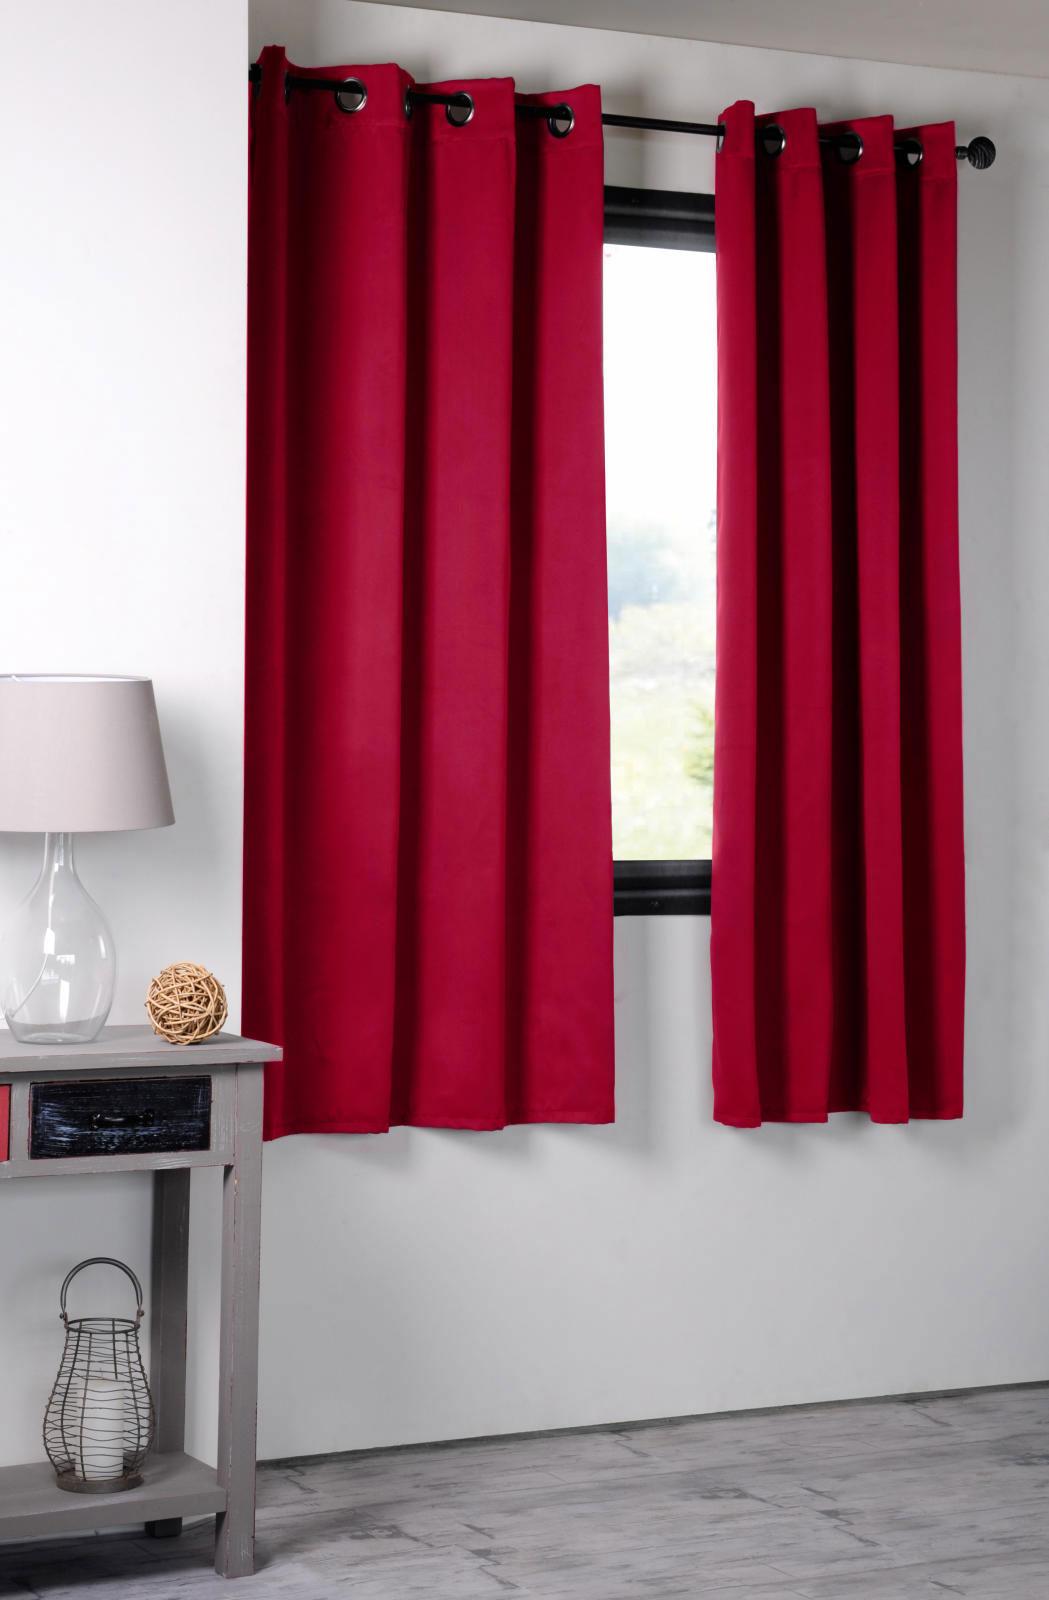 rideau occultant uni 210gr m2 rouge moutarde olive corail anis mauve canard. Black Bedroom Furniture Sets. Home Design Ideas